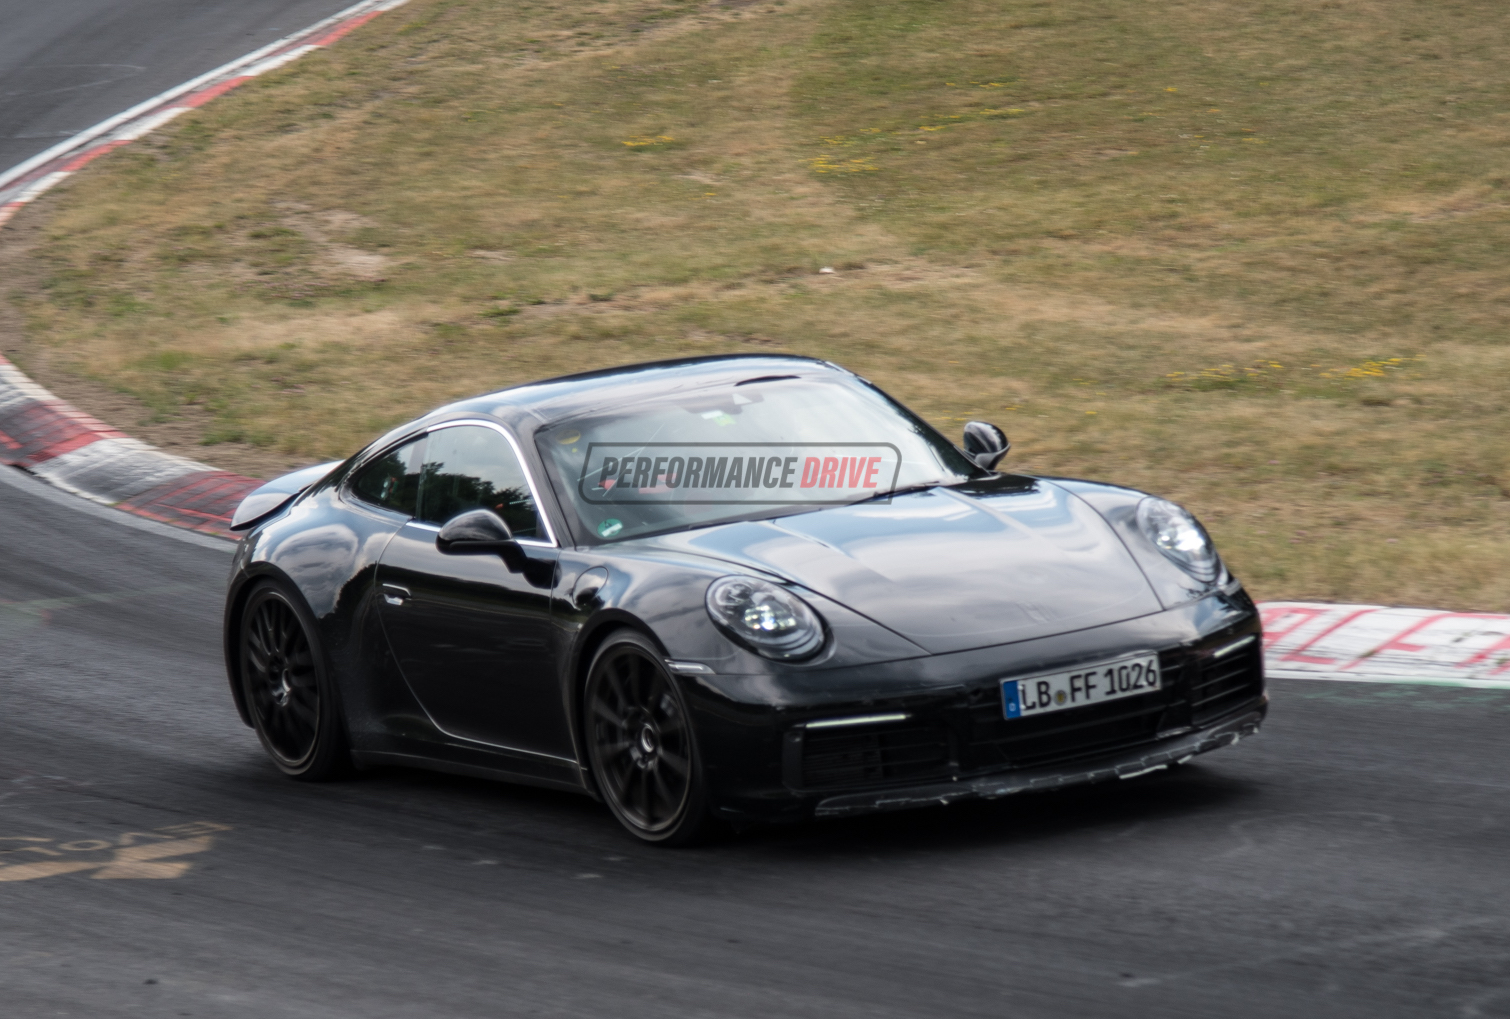 Peugeot Convertibles 2017 >> 2019 Porsche 911 992-3